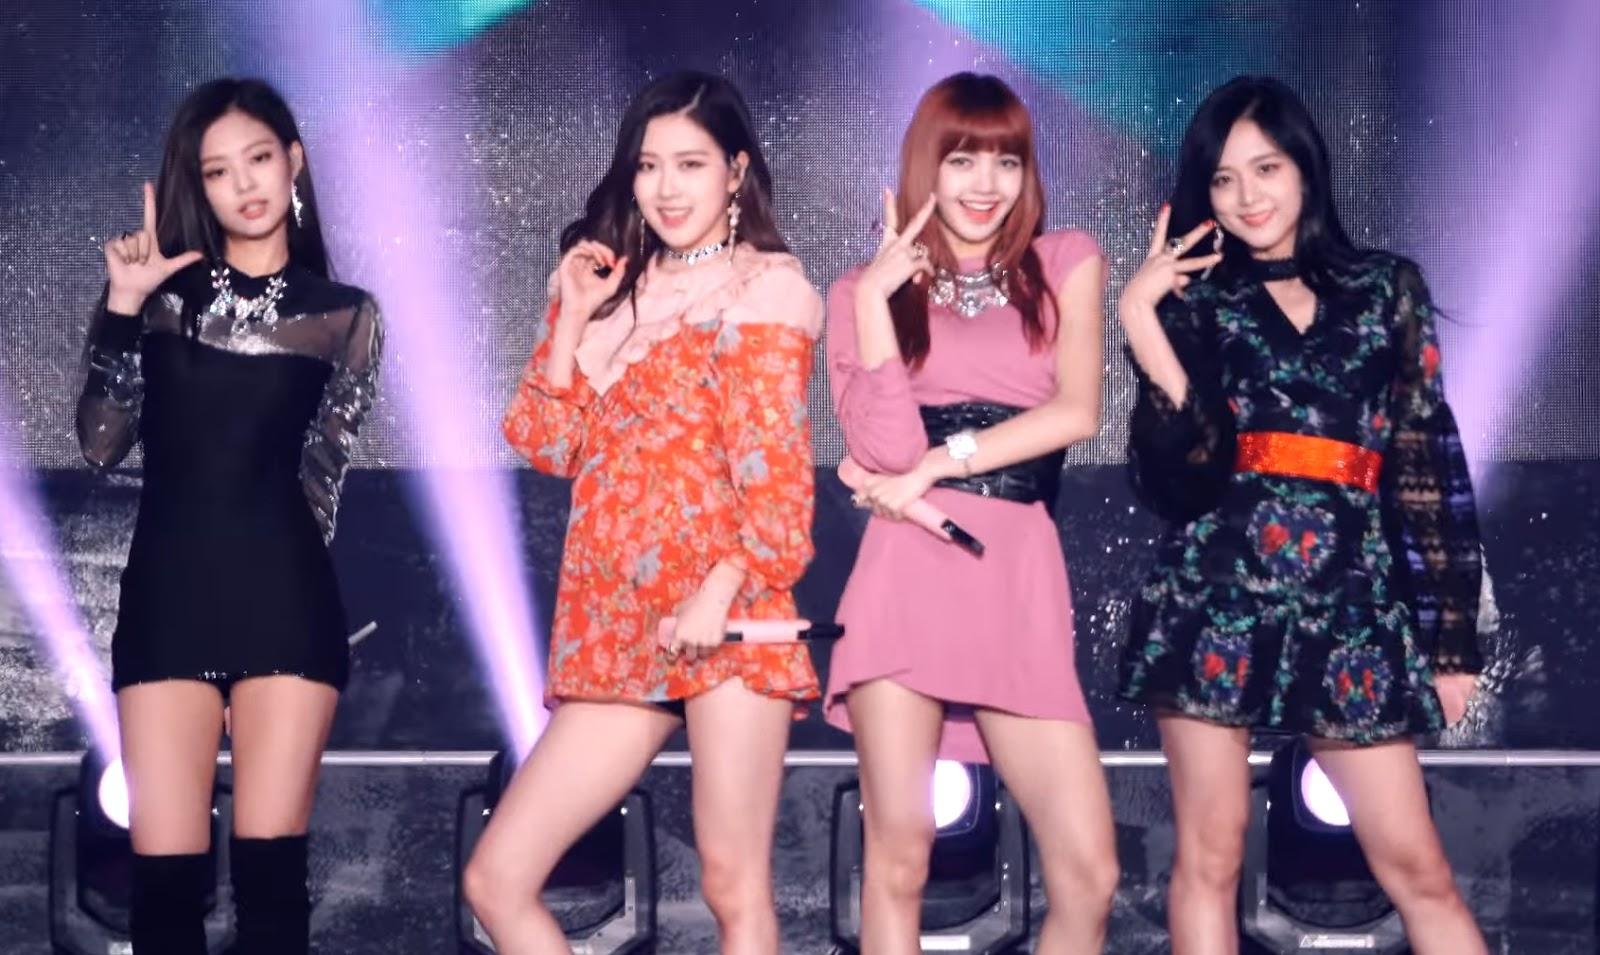 blackpink 2nd girl group yg treasure box